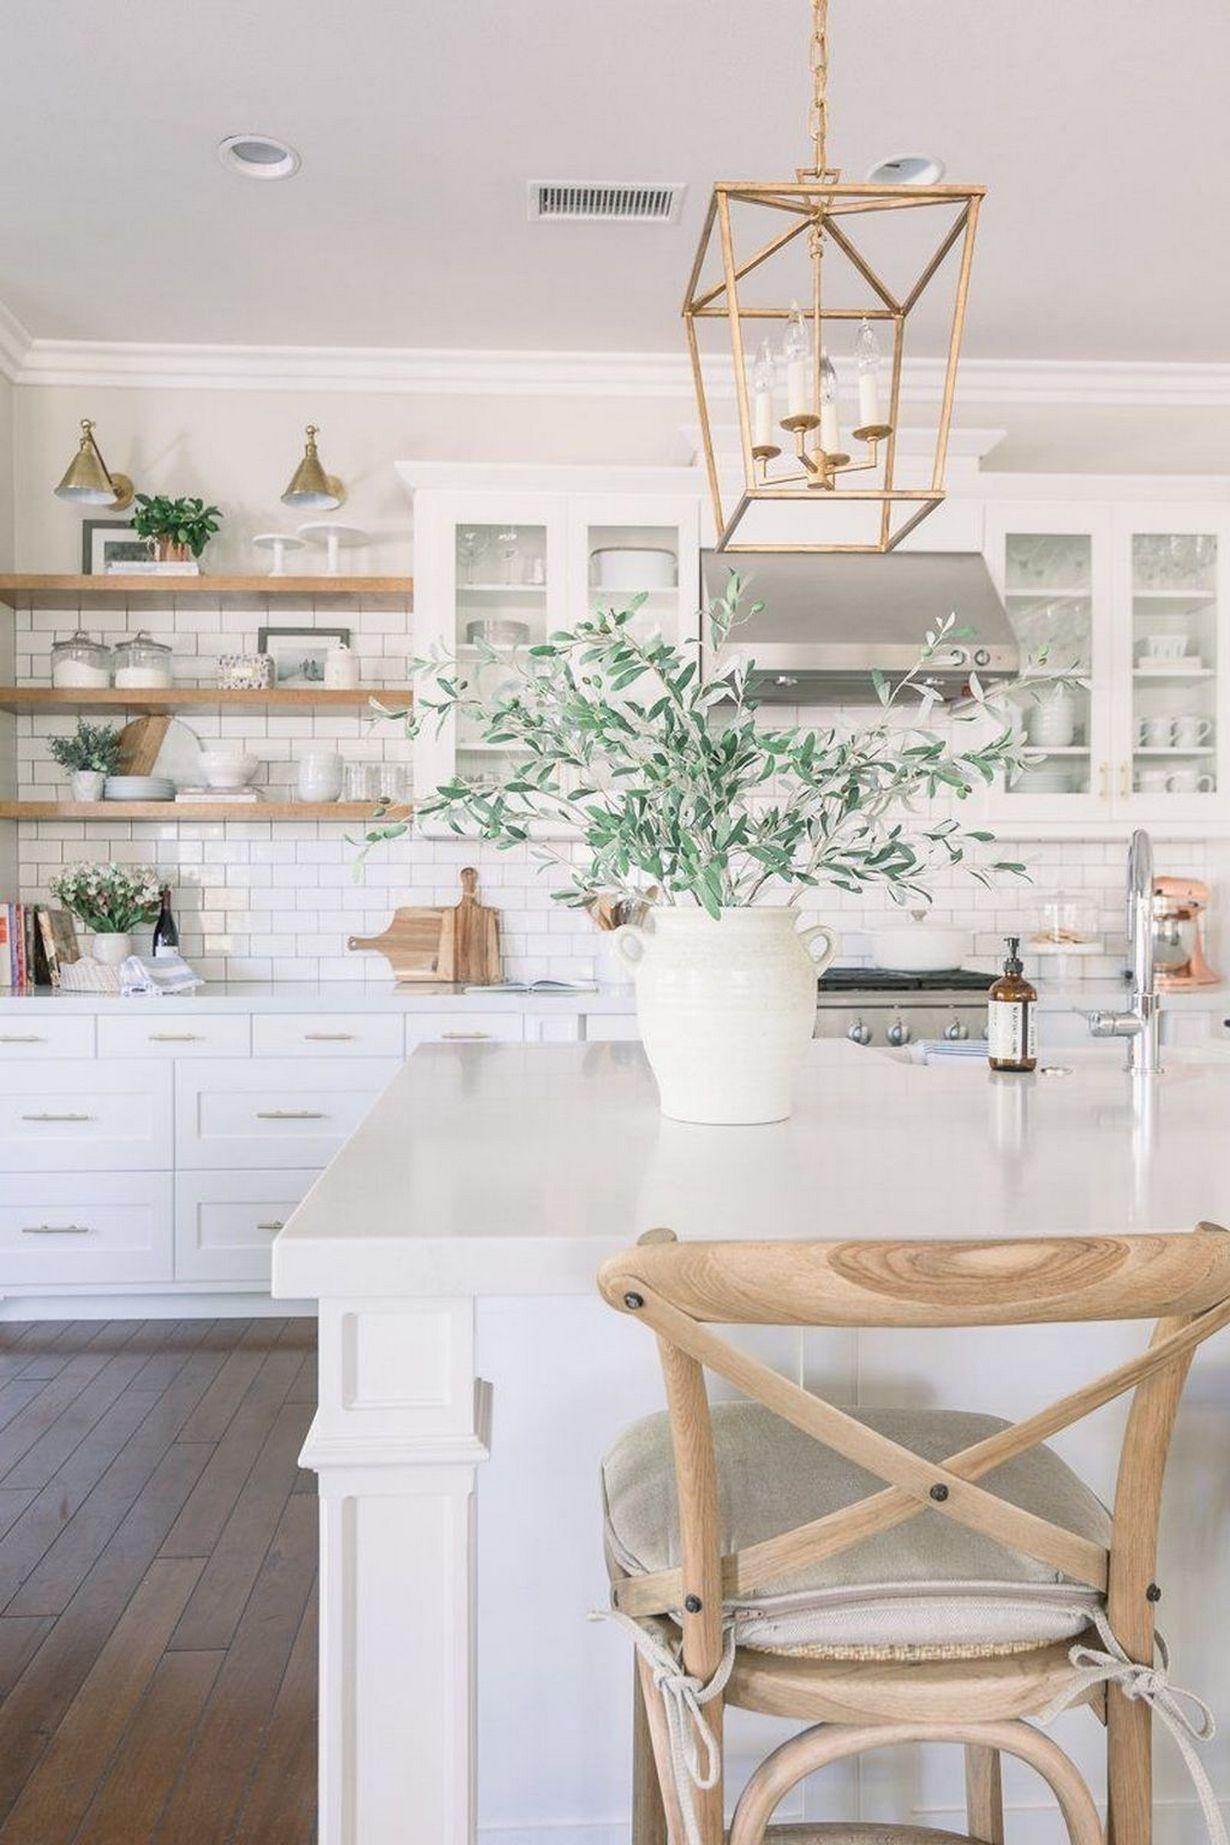 40 Blanc Extraordinaires Idees Cuisine De 20 Blanc Cuisine Extraordinaires Idees Farmhouse Kitchen Design Interior Design Kitchen Home Decor Kitchen